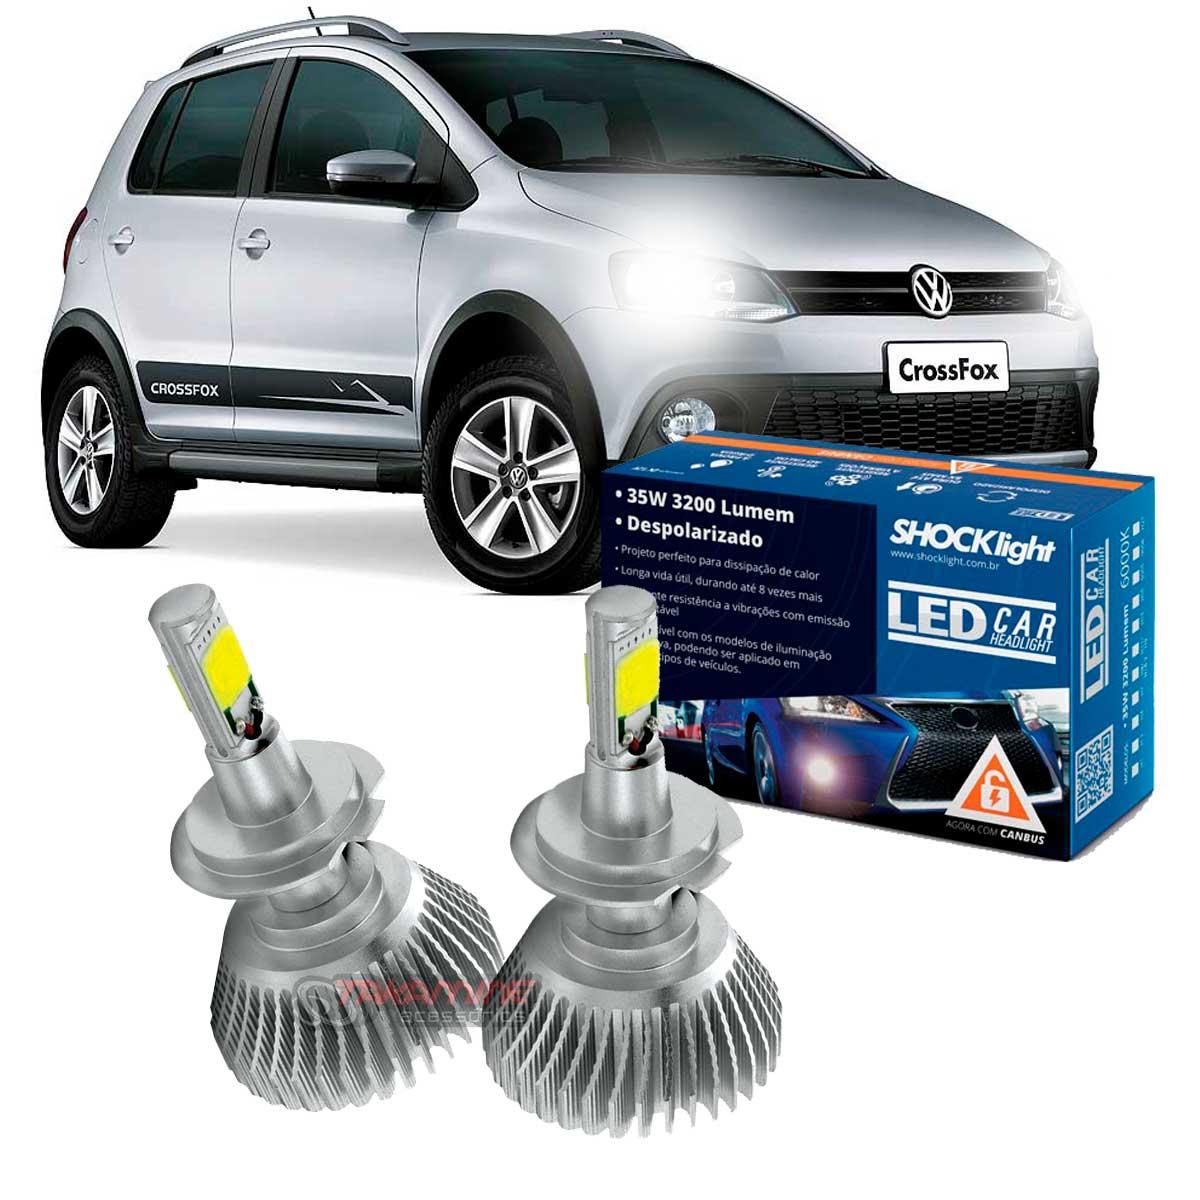 Kit LED Crossfox 2010 2011 2012 2013 2014 2015 tipo xenon farol baixo H7 35W Headlight